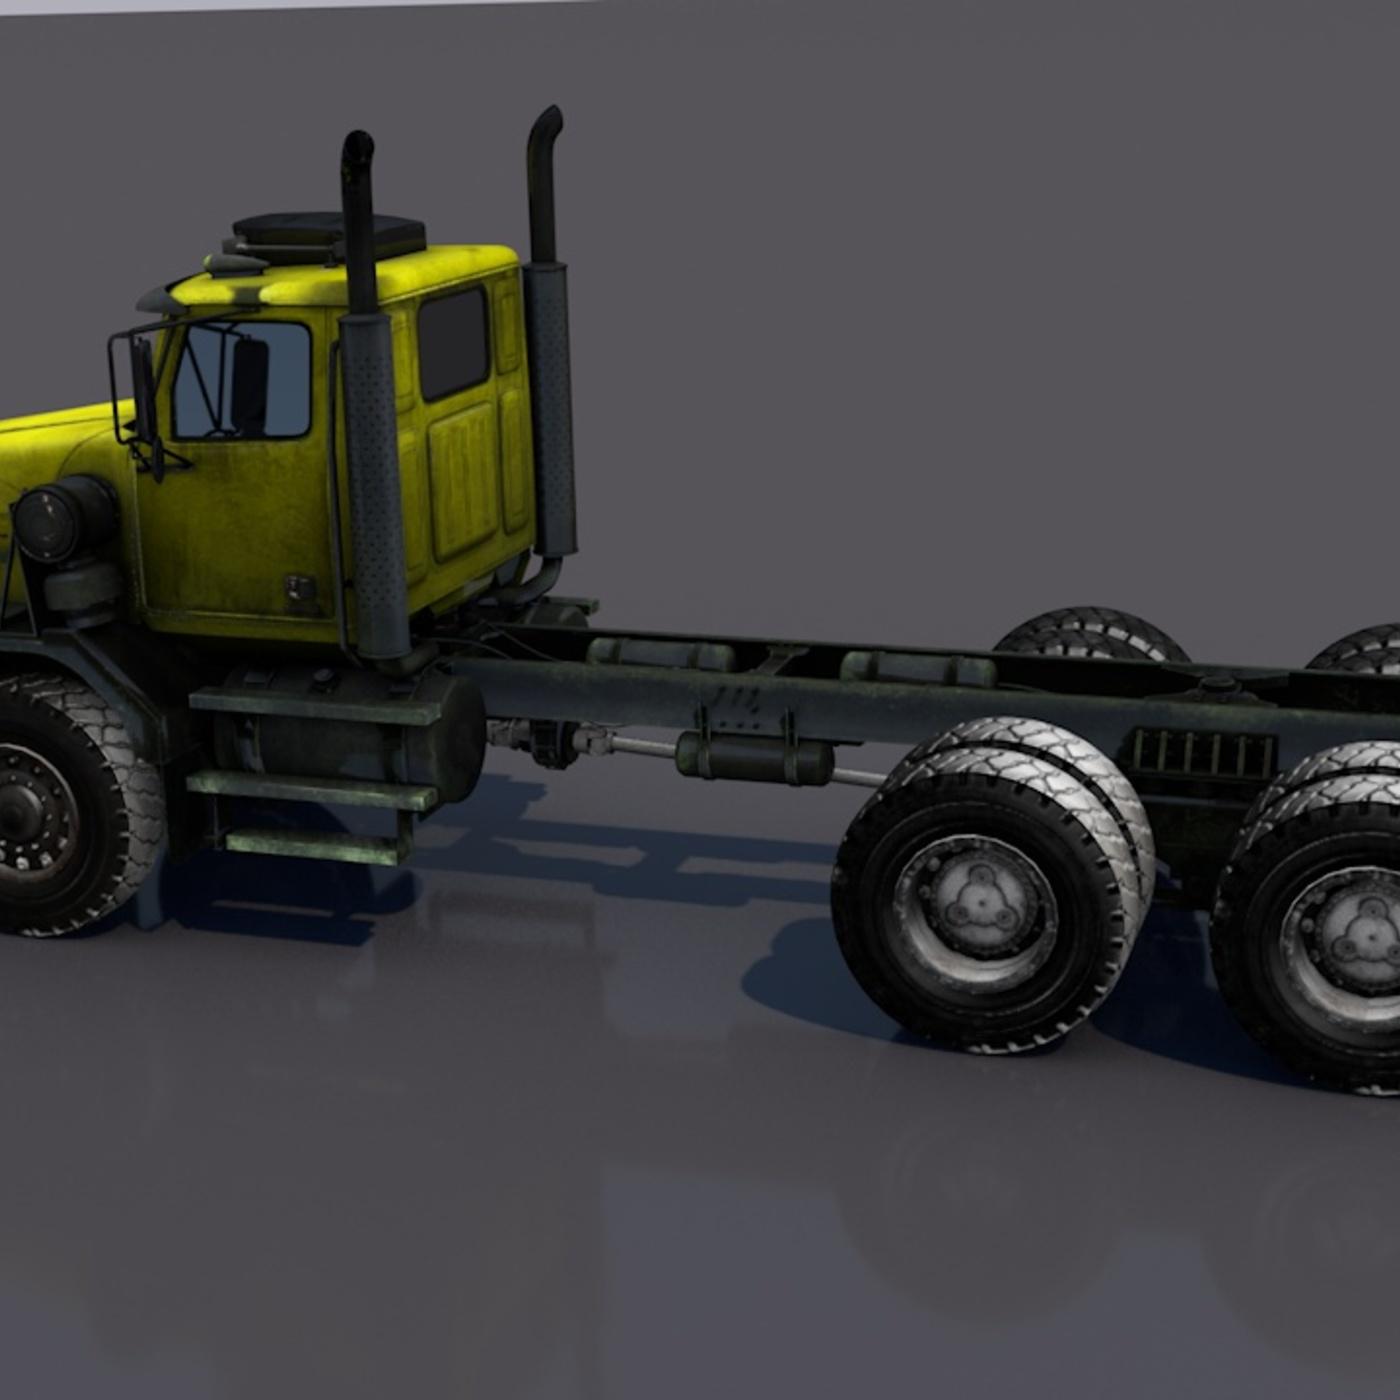 Western star truck